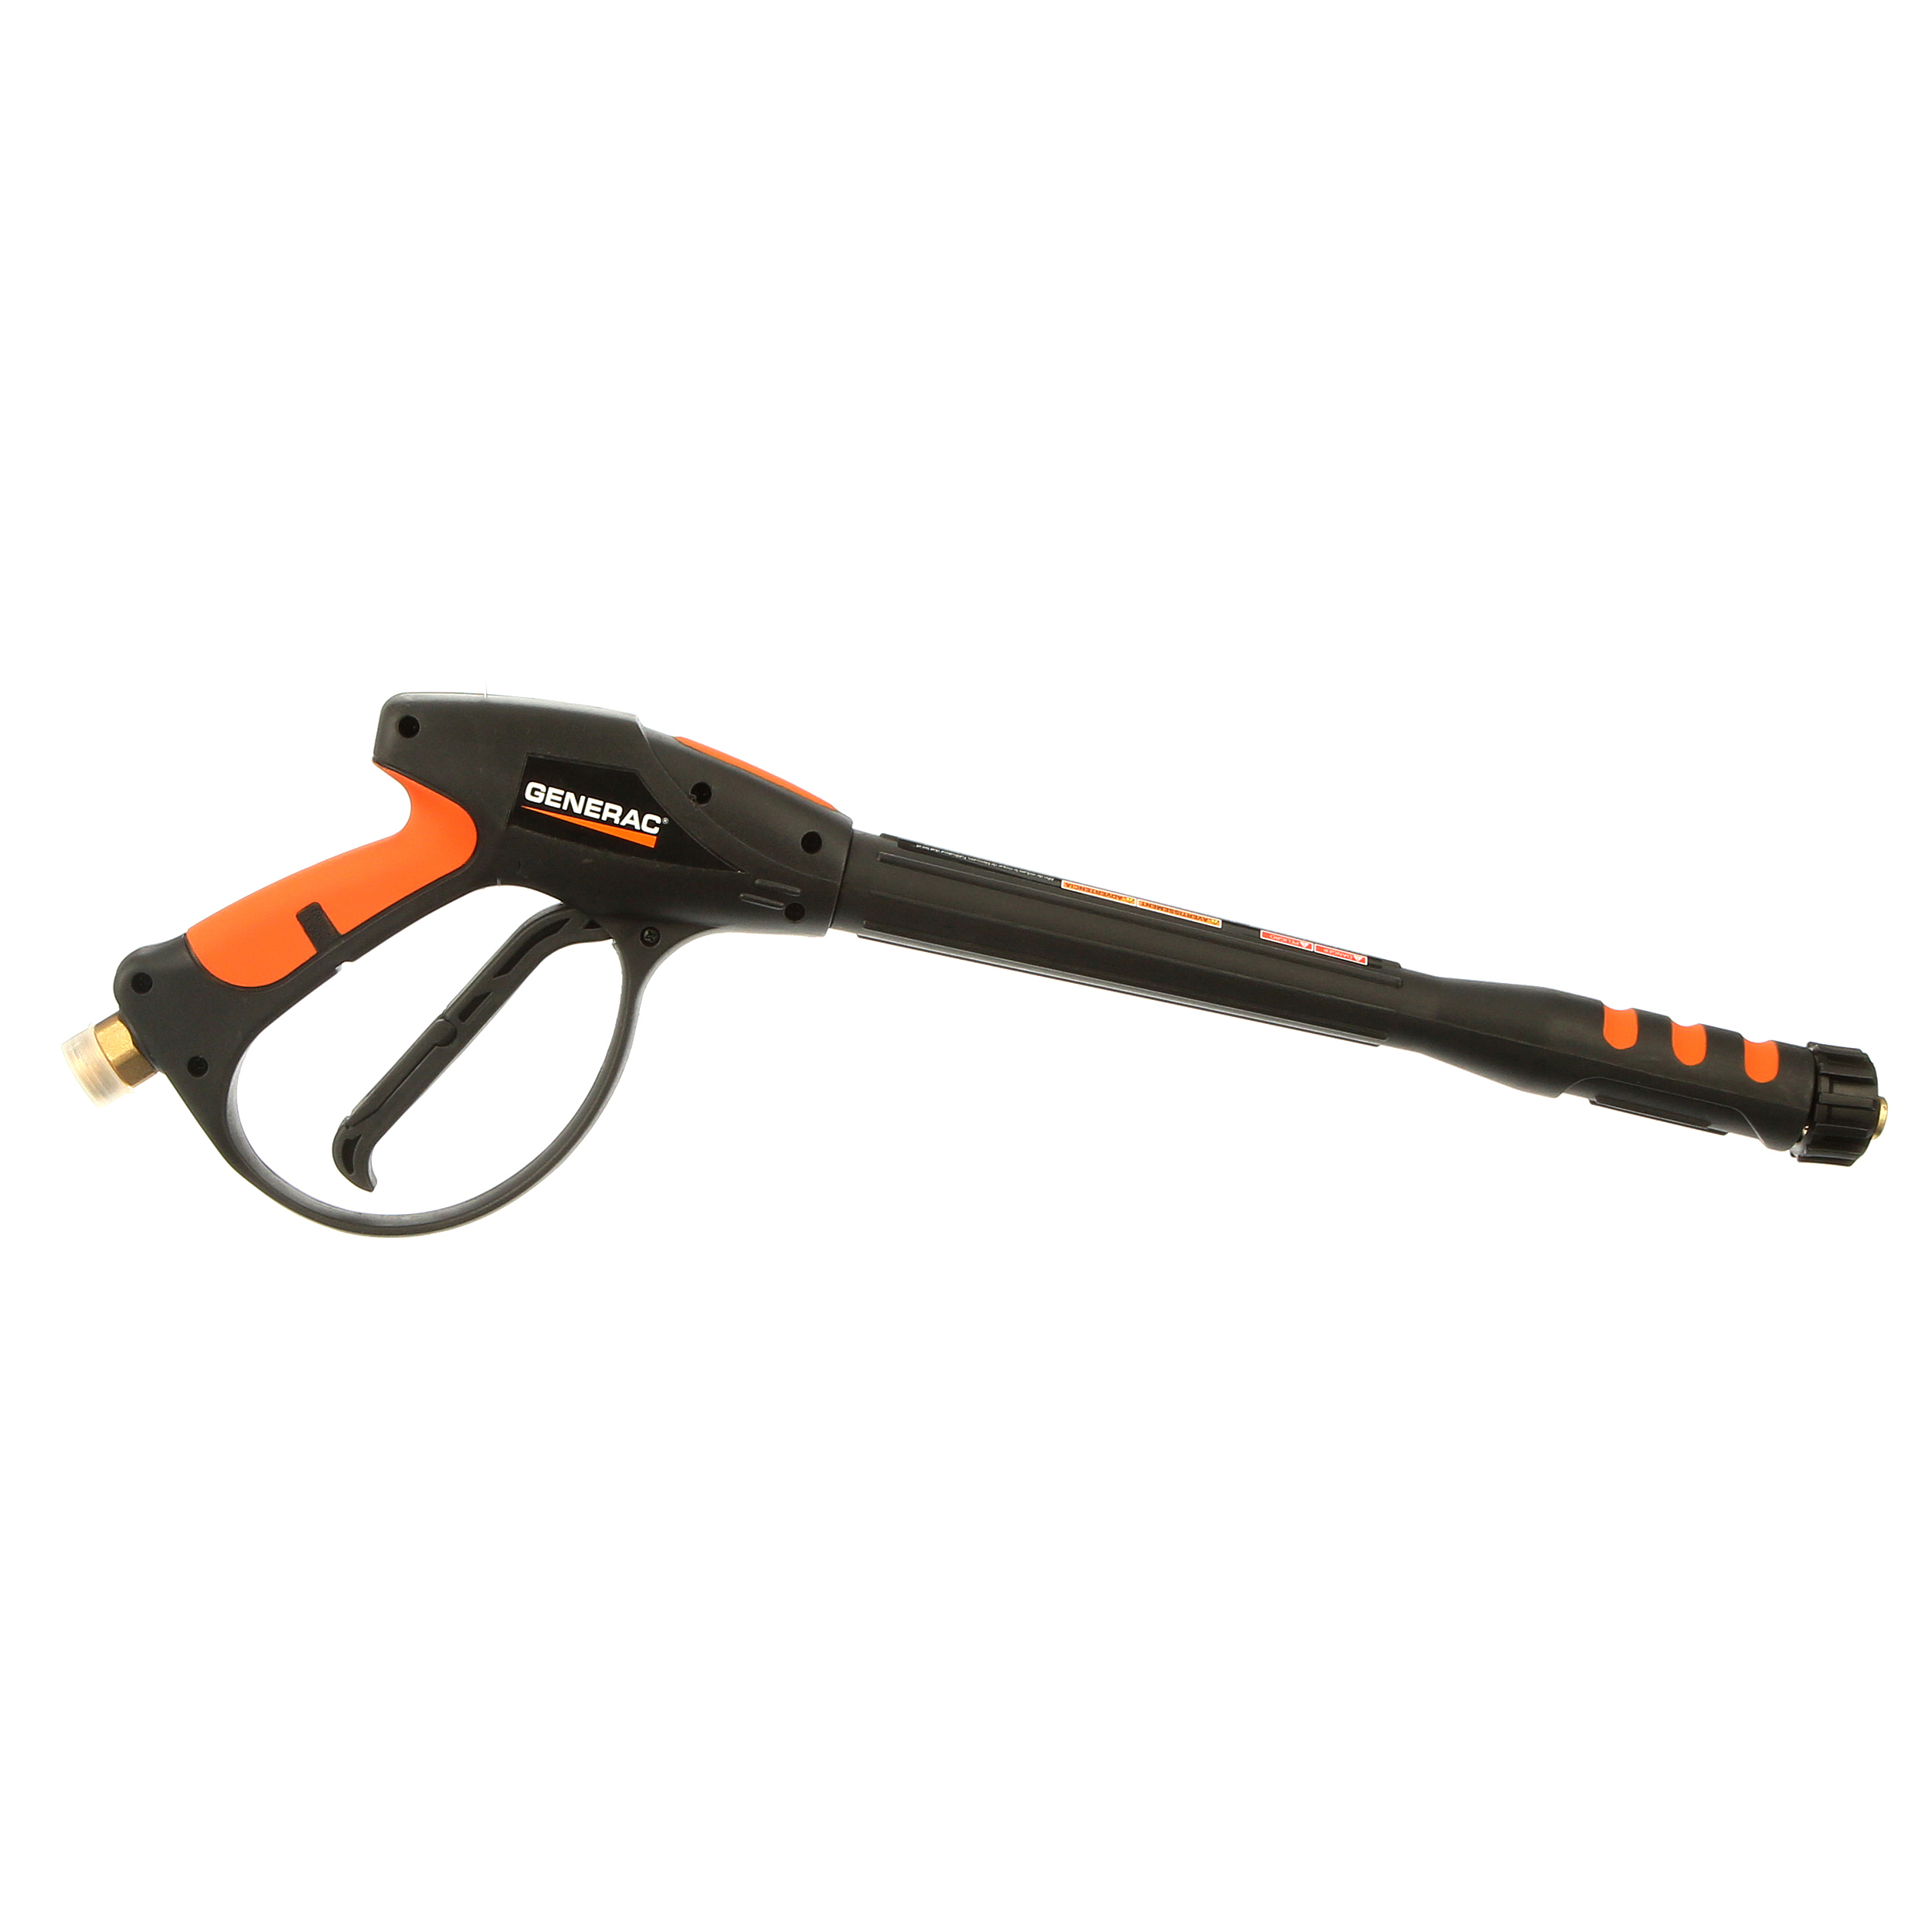 Pressure Washer Gun >> Generac 3000 Psi Pressure Washer Gun